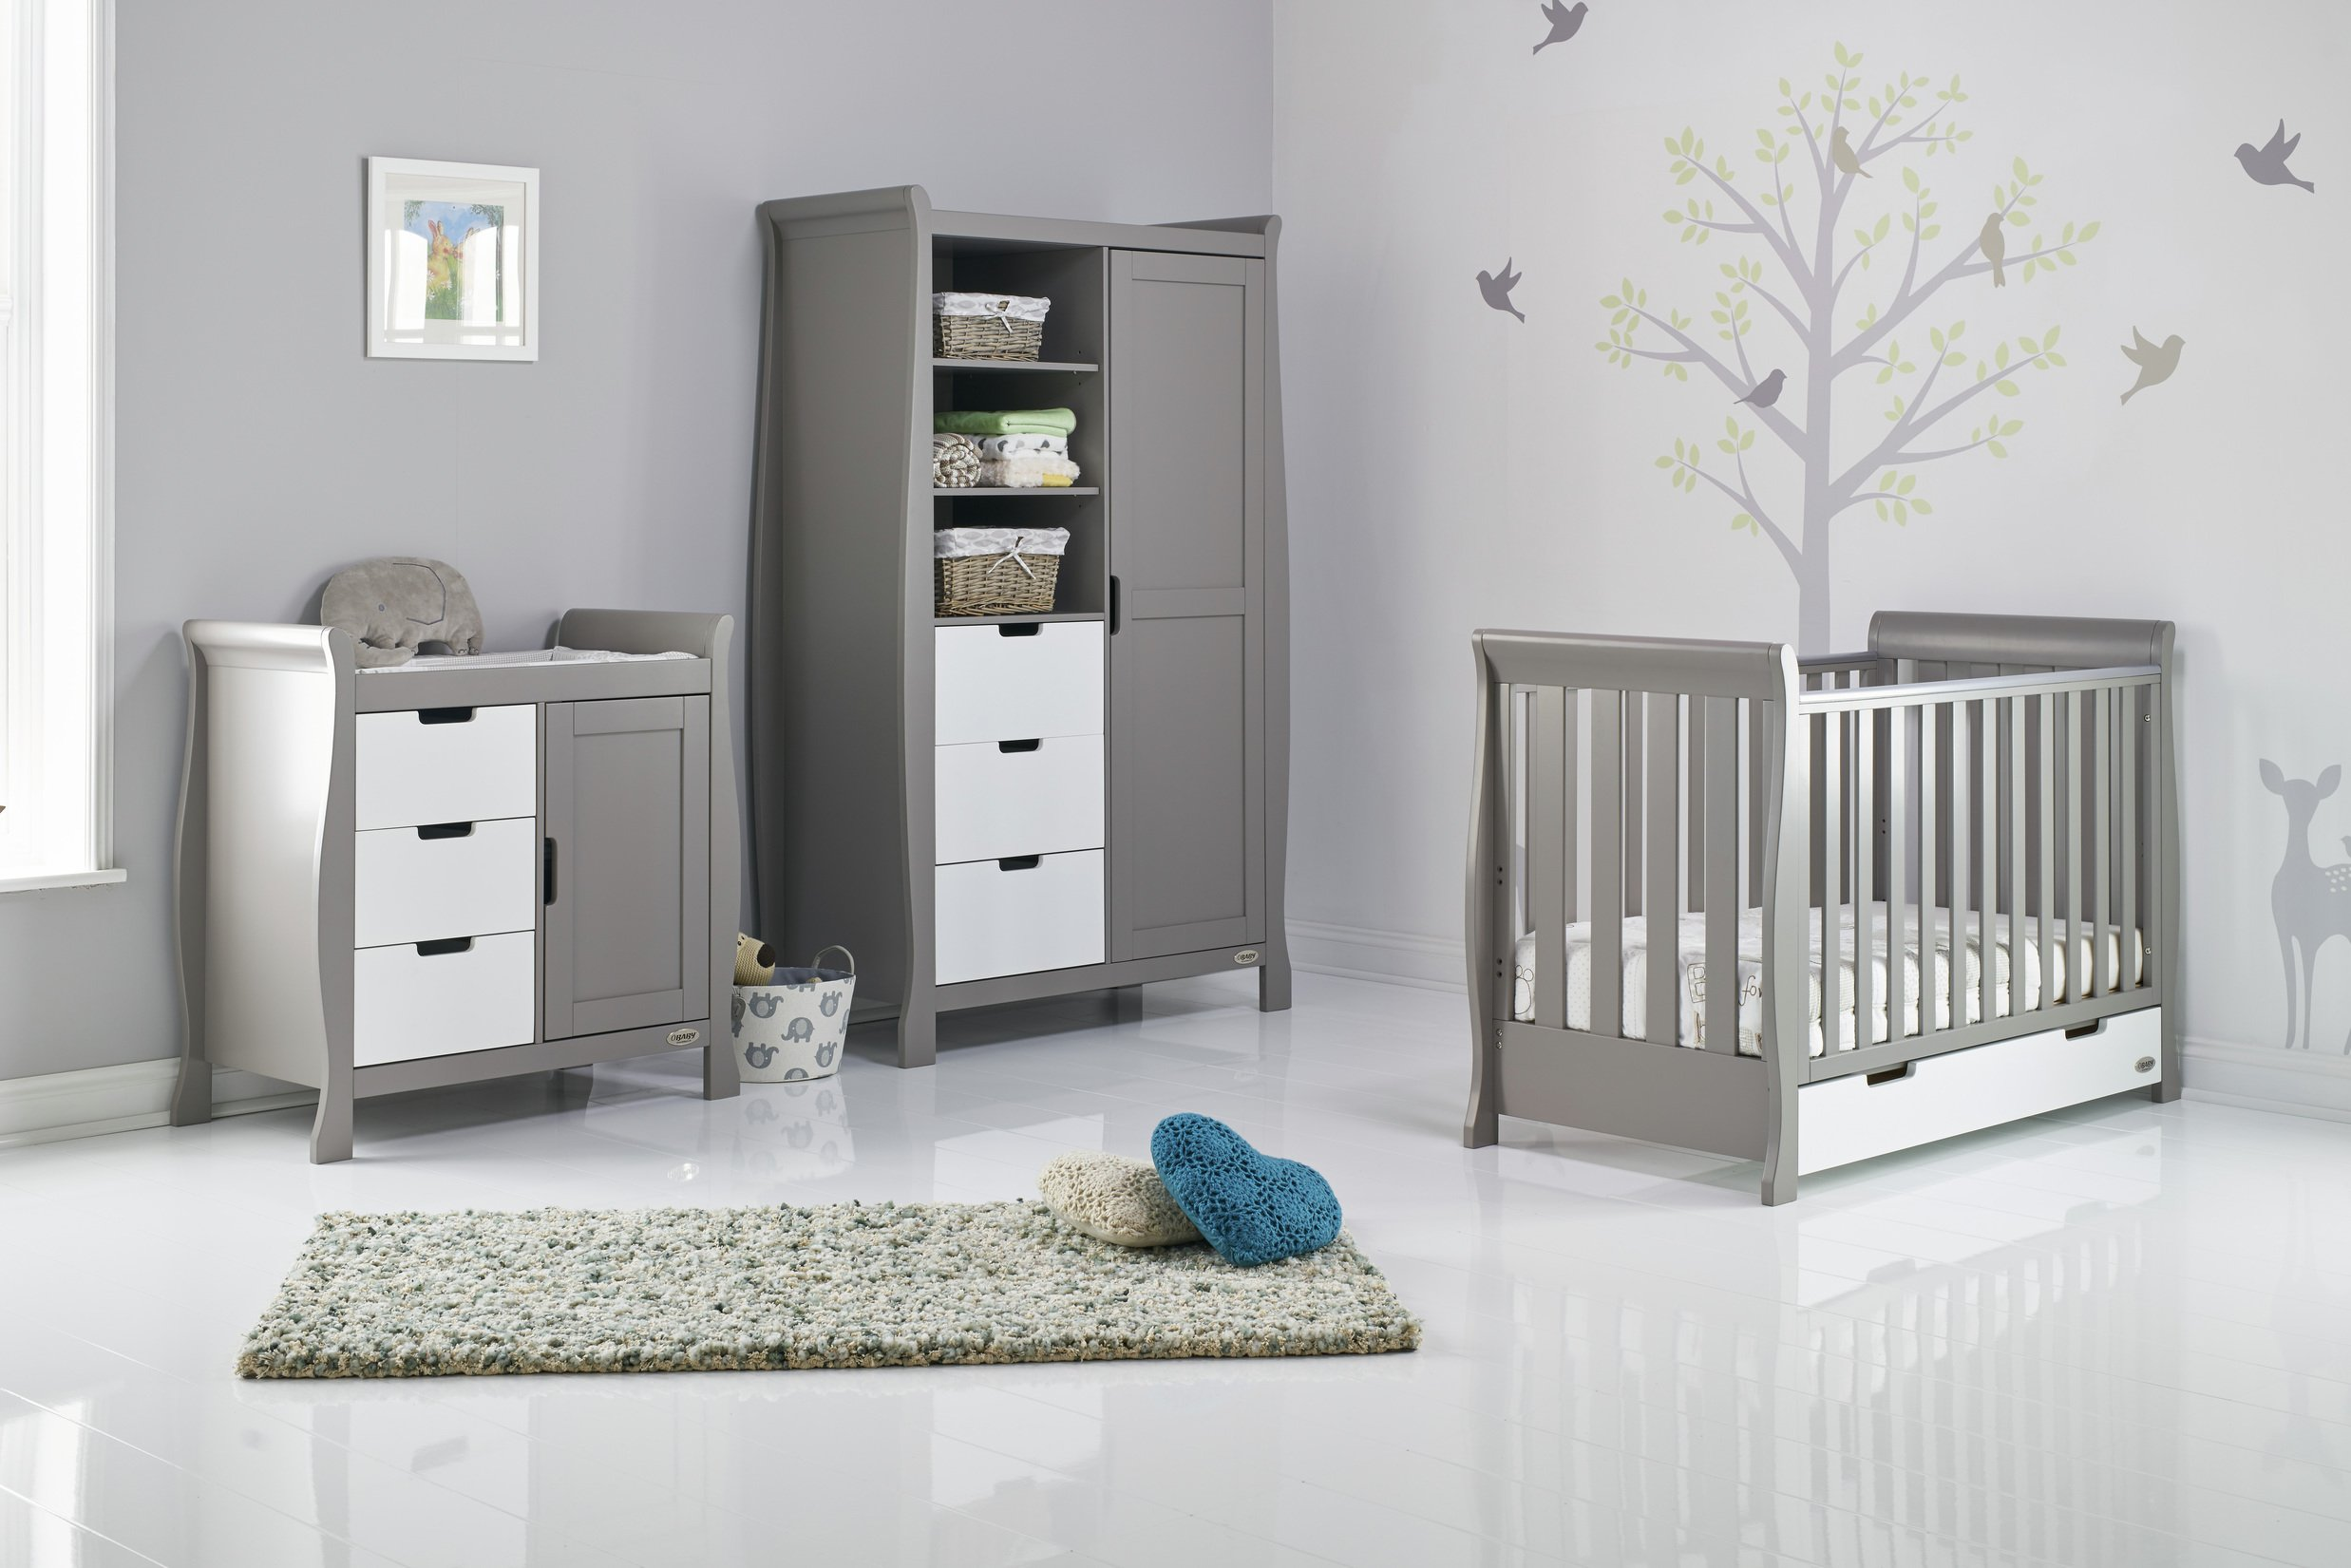 Obaby Stamford Mini Sleigh 3 Piece Room Set - Grey & White